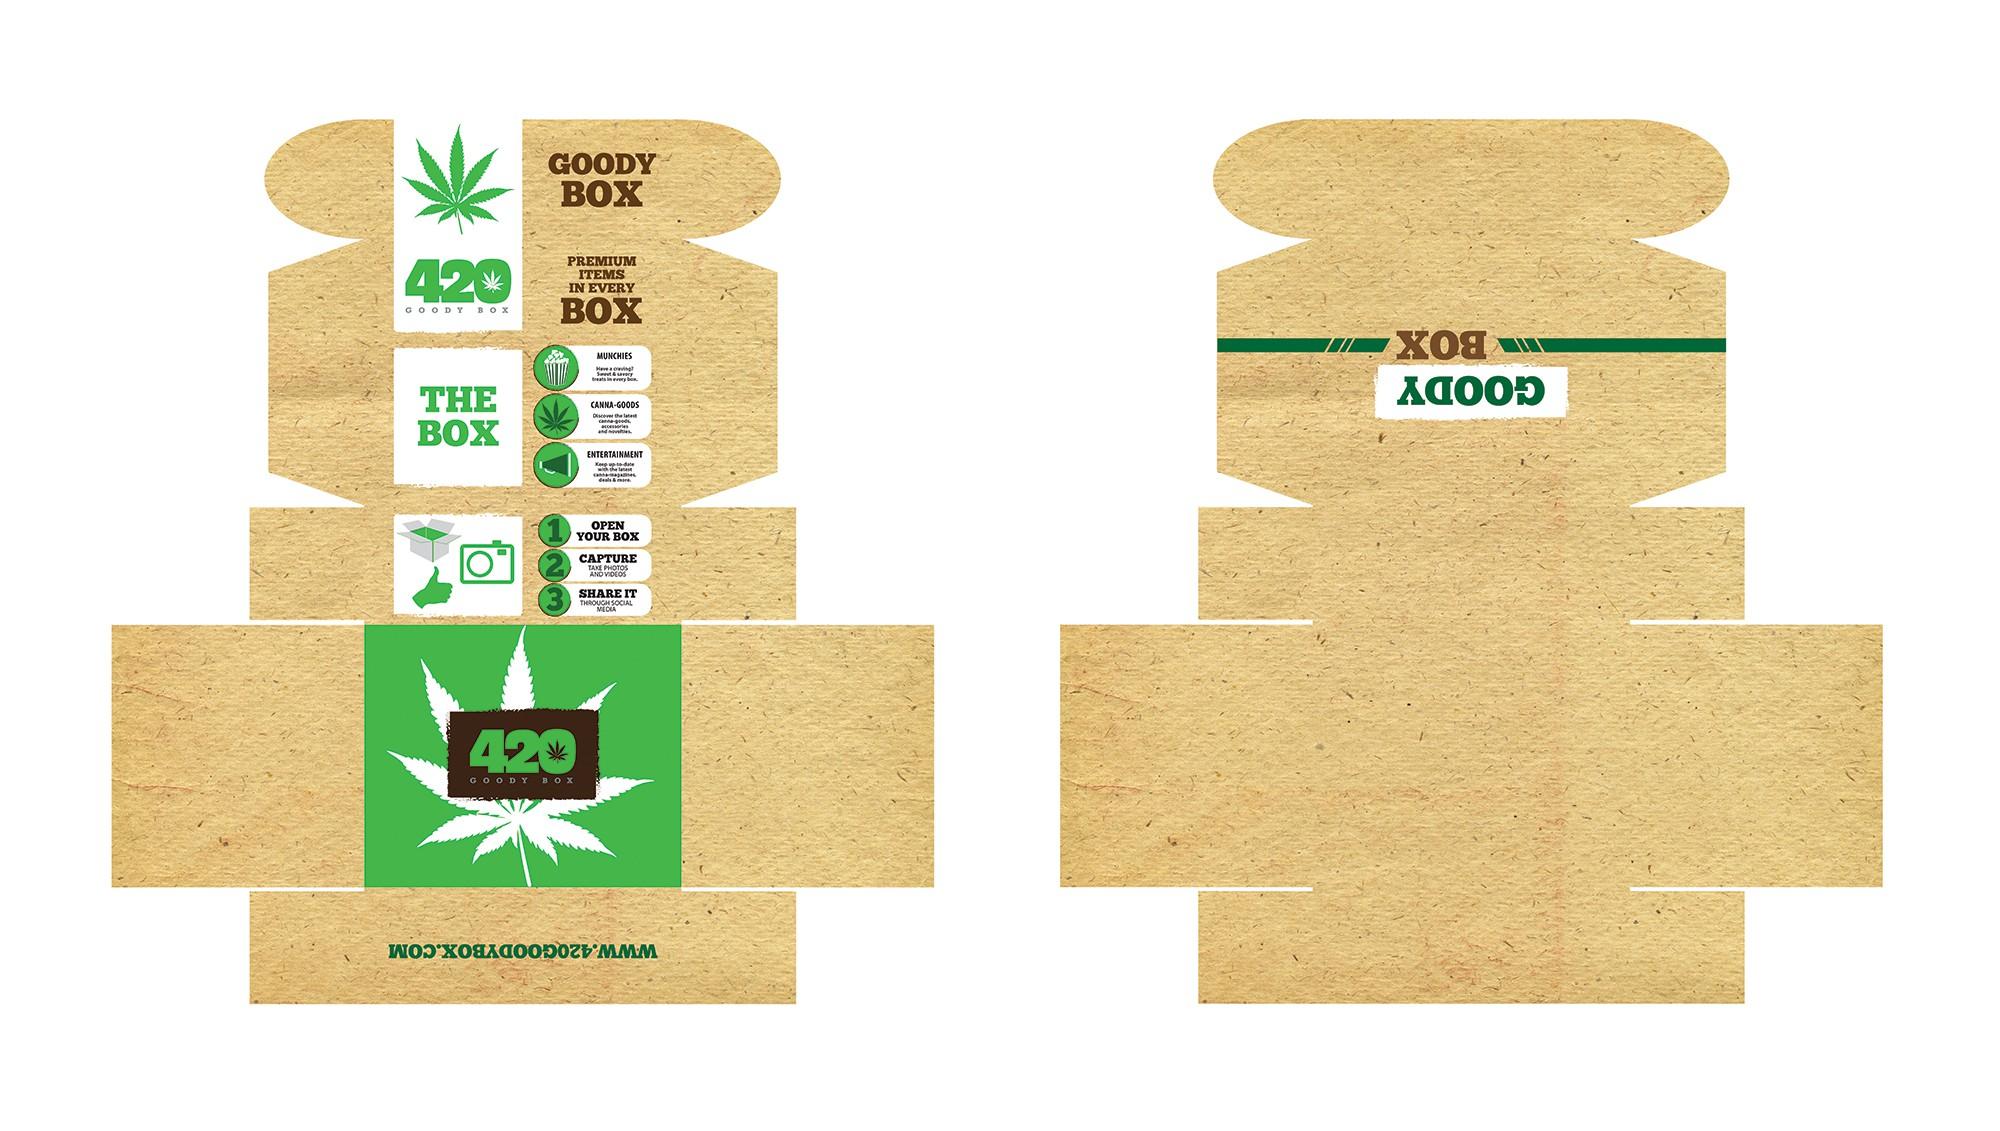 Create a winning box design for 420 Goody Box.